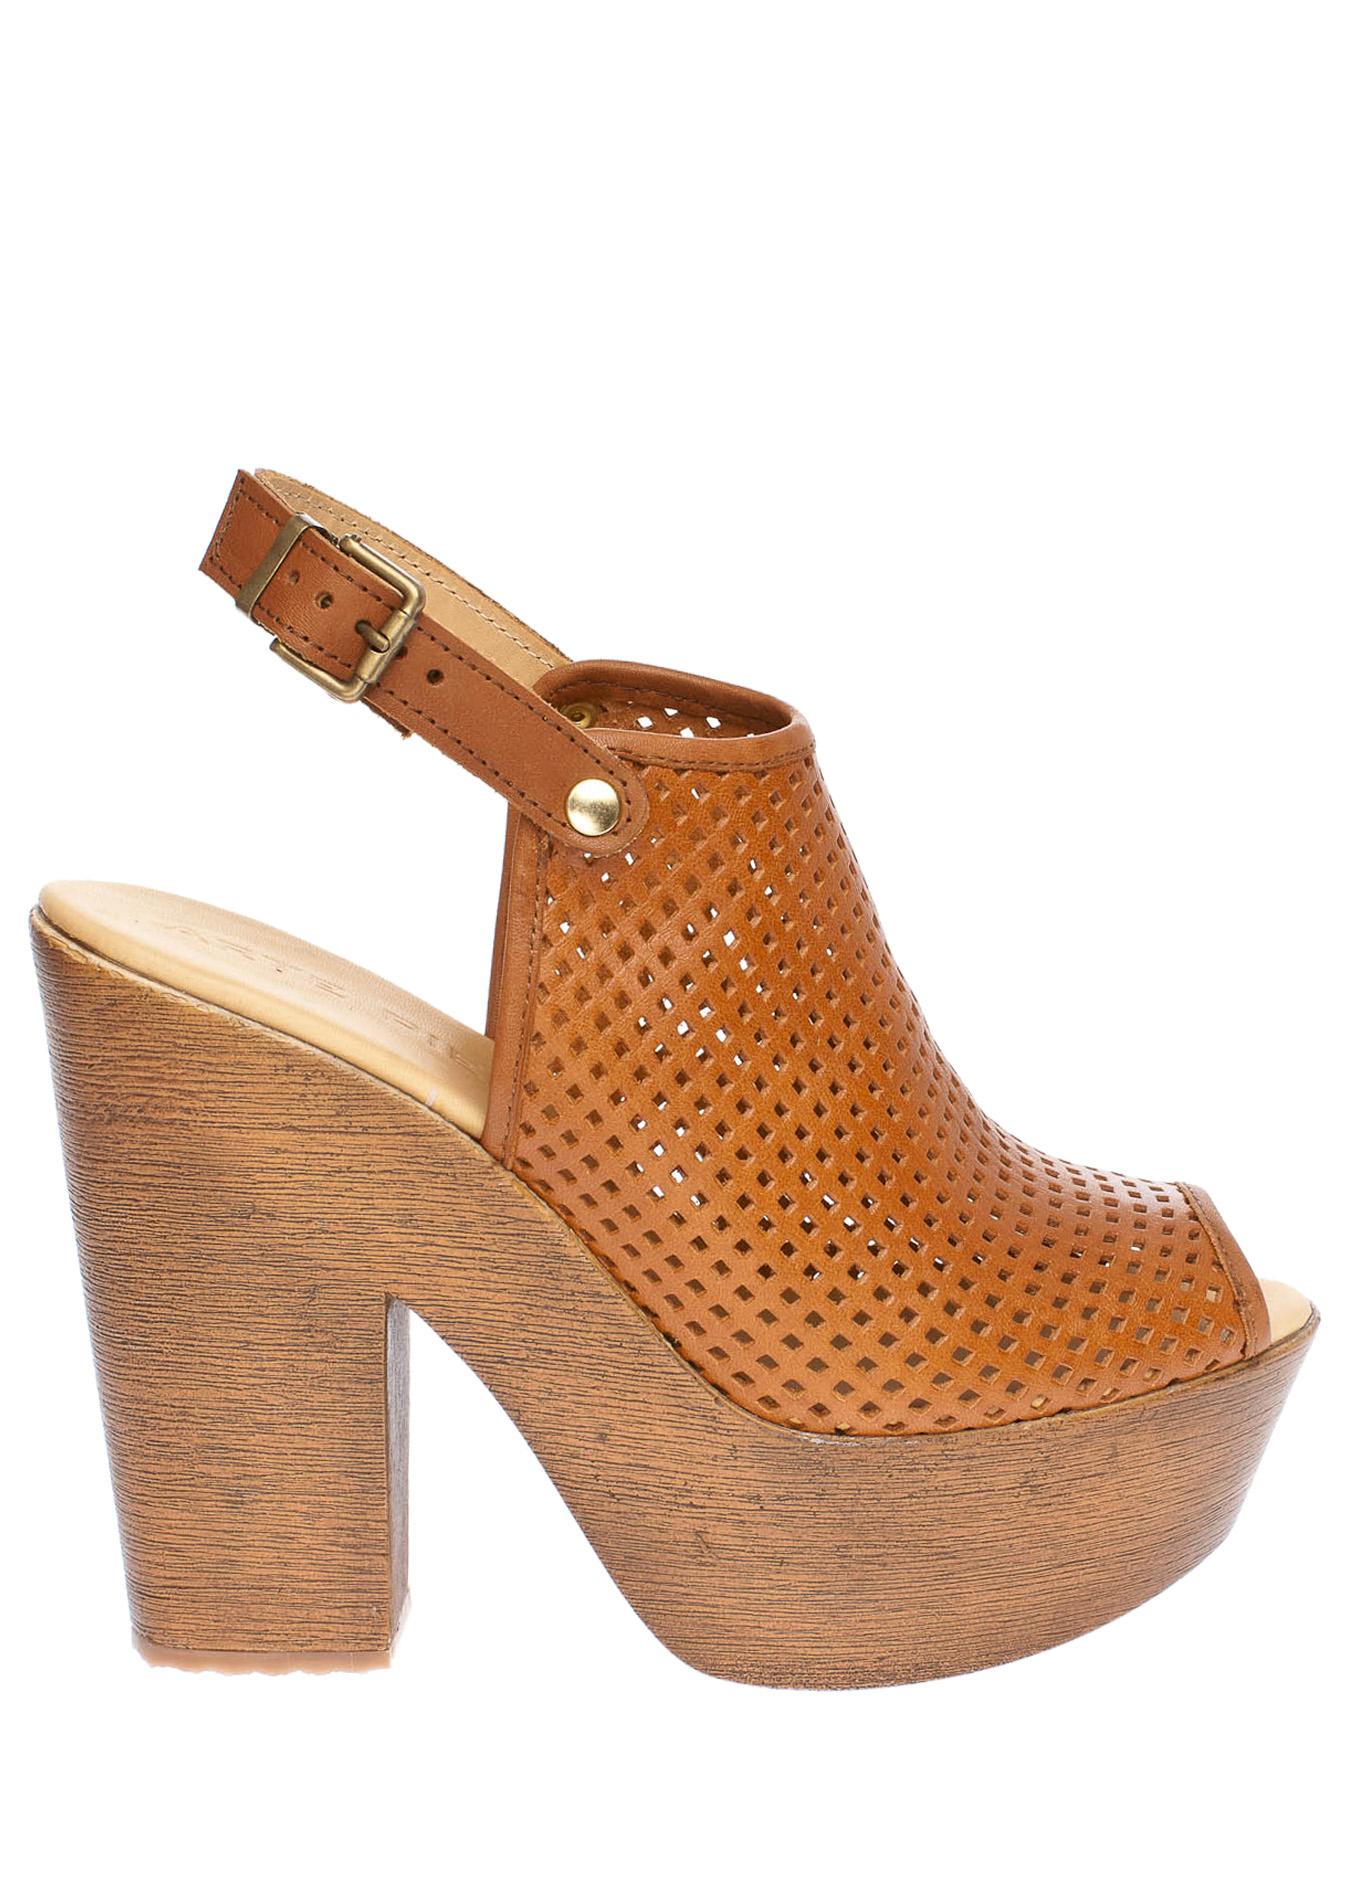 Erin δερμάτινη πλατφόρμα, ταμπά παπούτσια